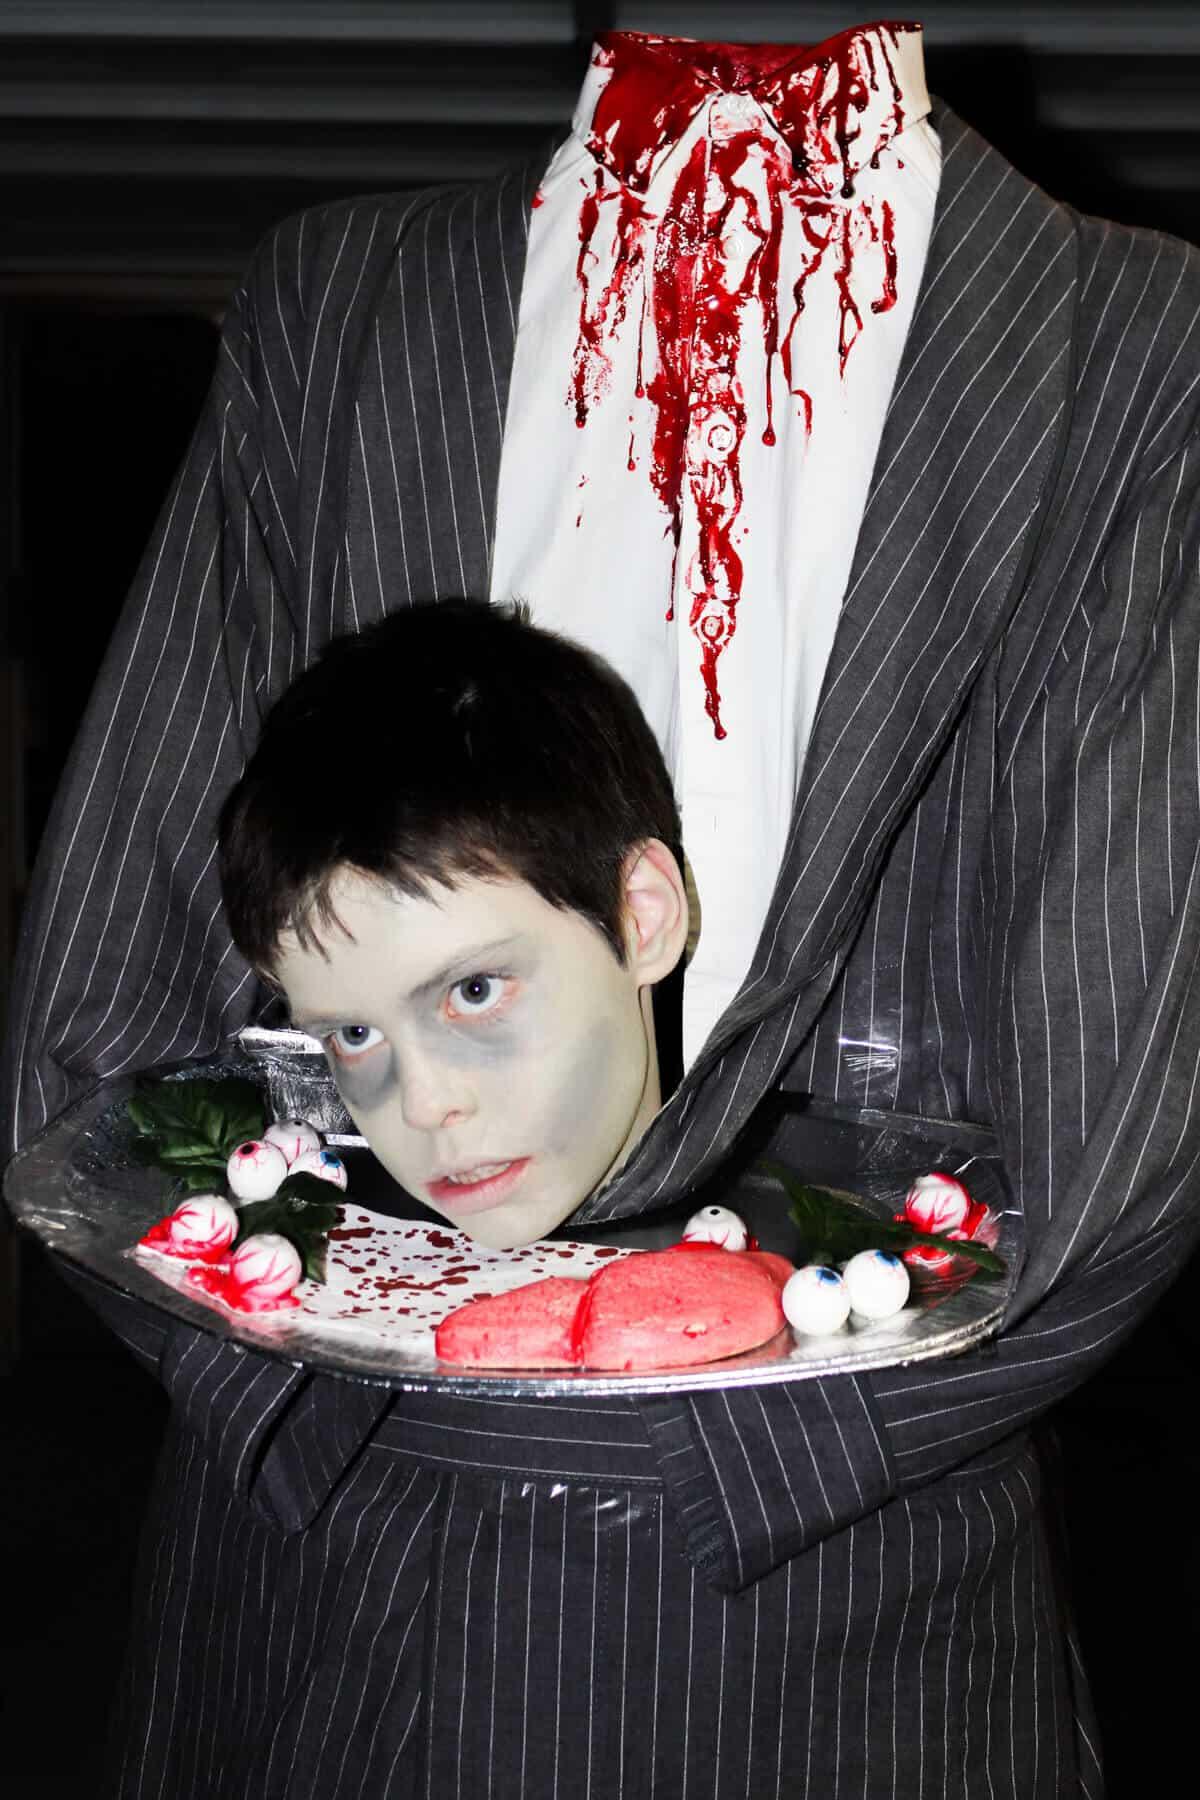 kid costume head on a tray